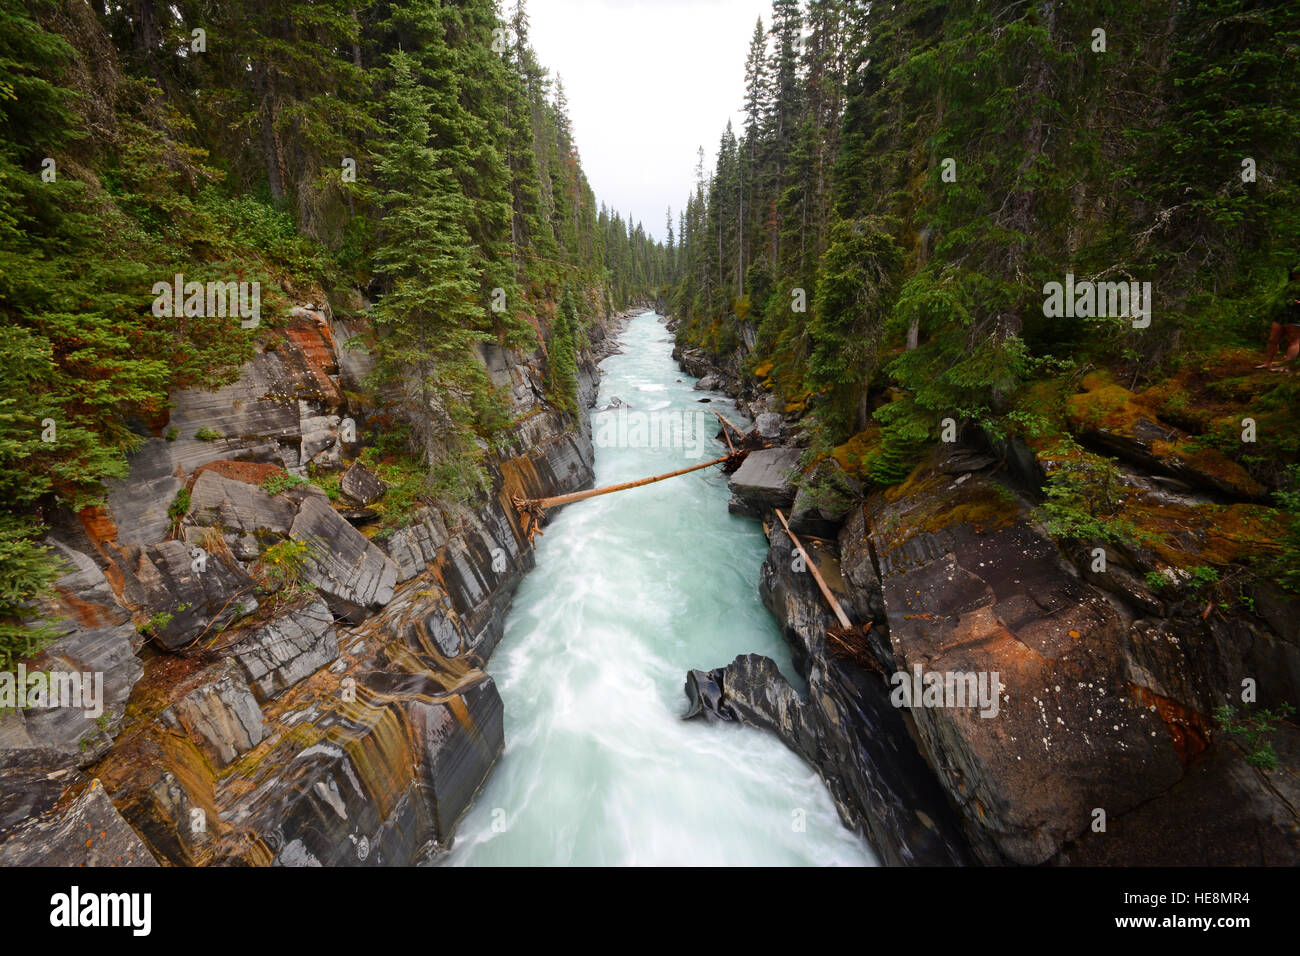 Creek in canyon Kootenay National park, Canada - Stock Image